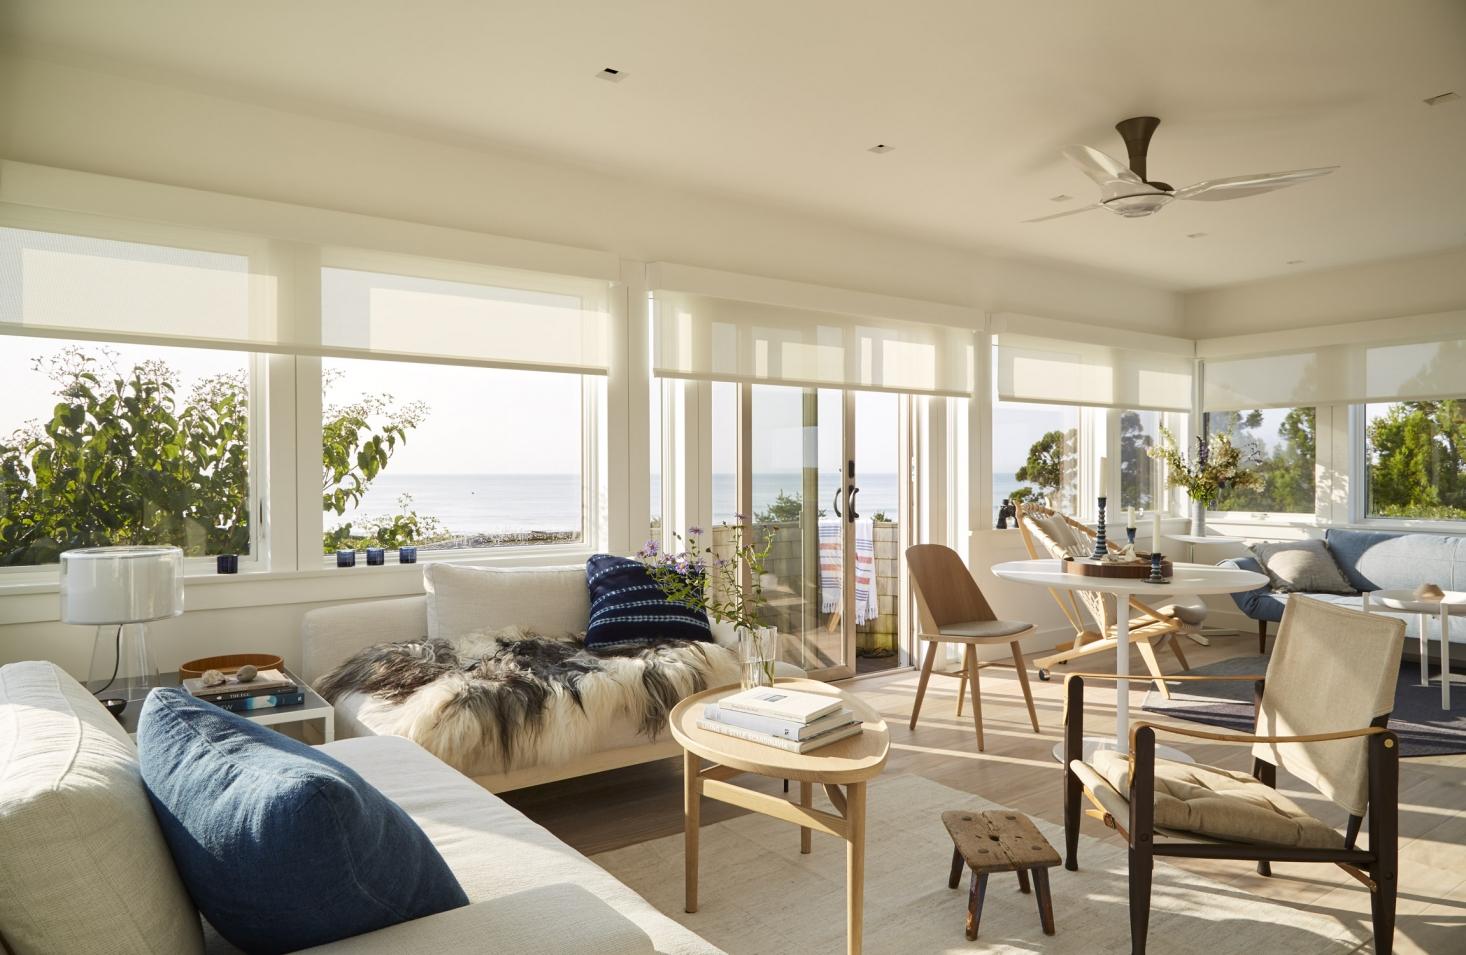 living-room-chilmark-mass-lounge-chairs-white-walls-1466x955.jpg